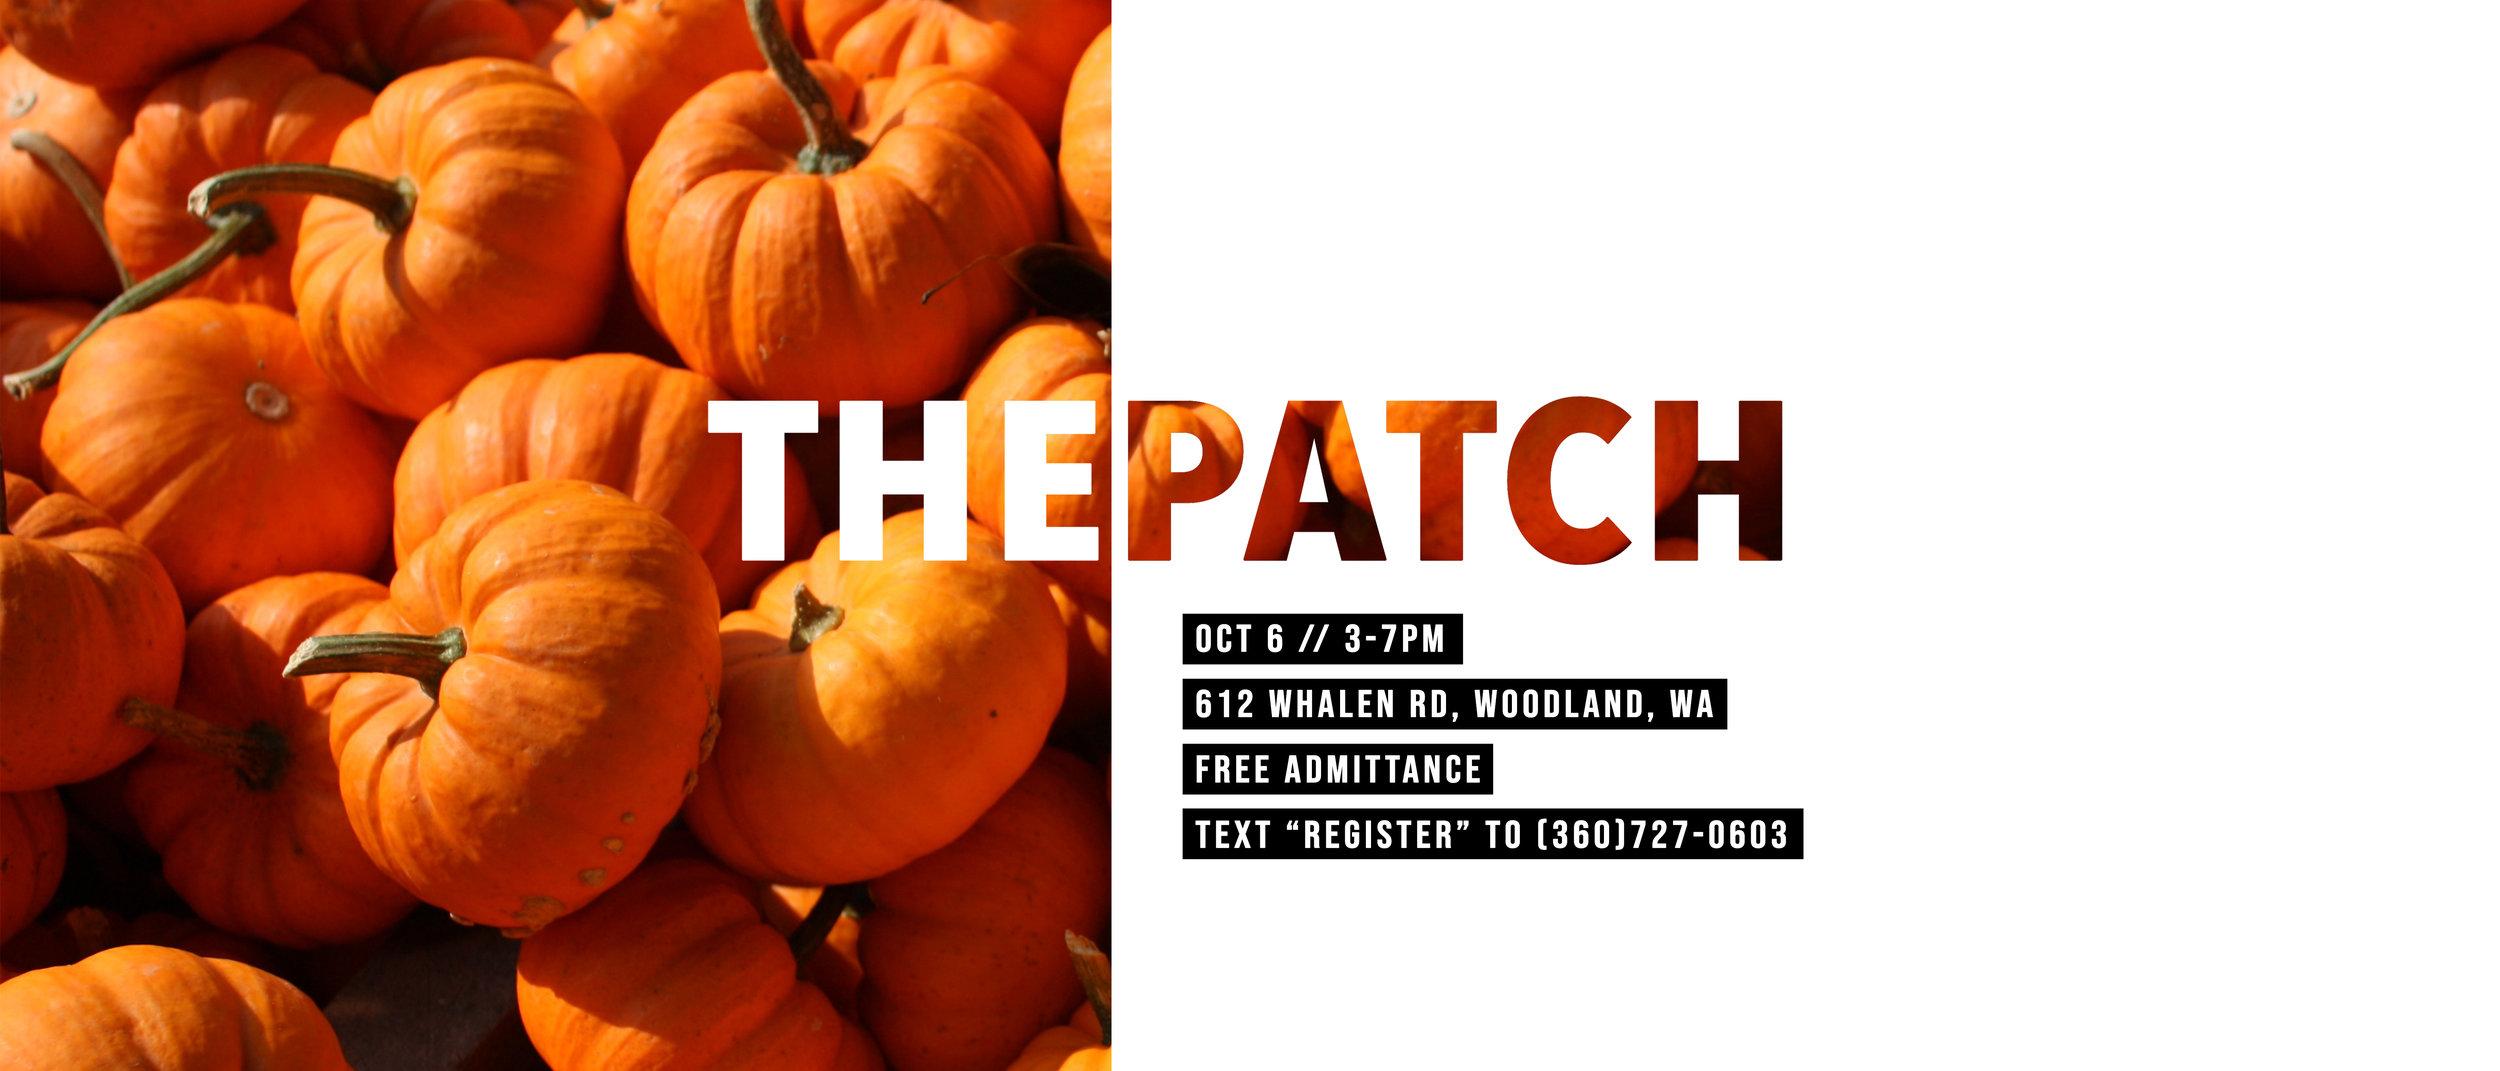 ThePatch02.jpg